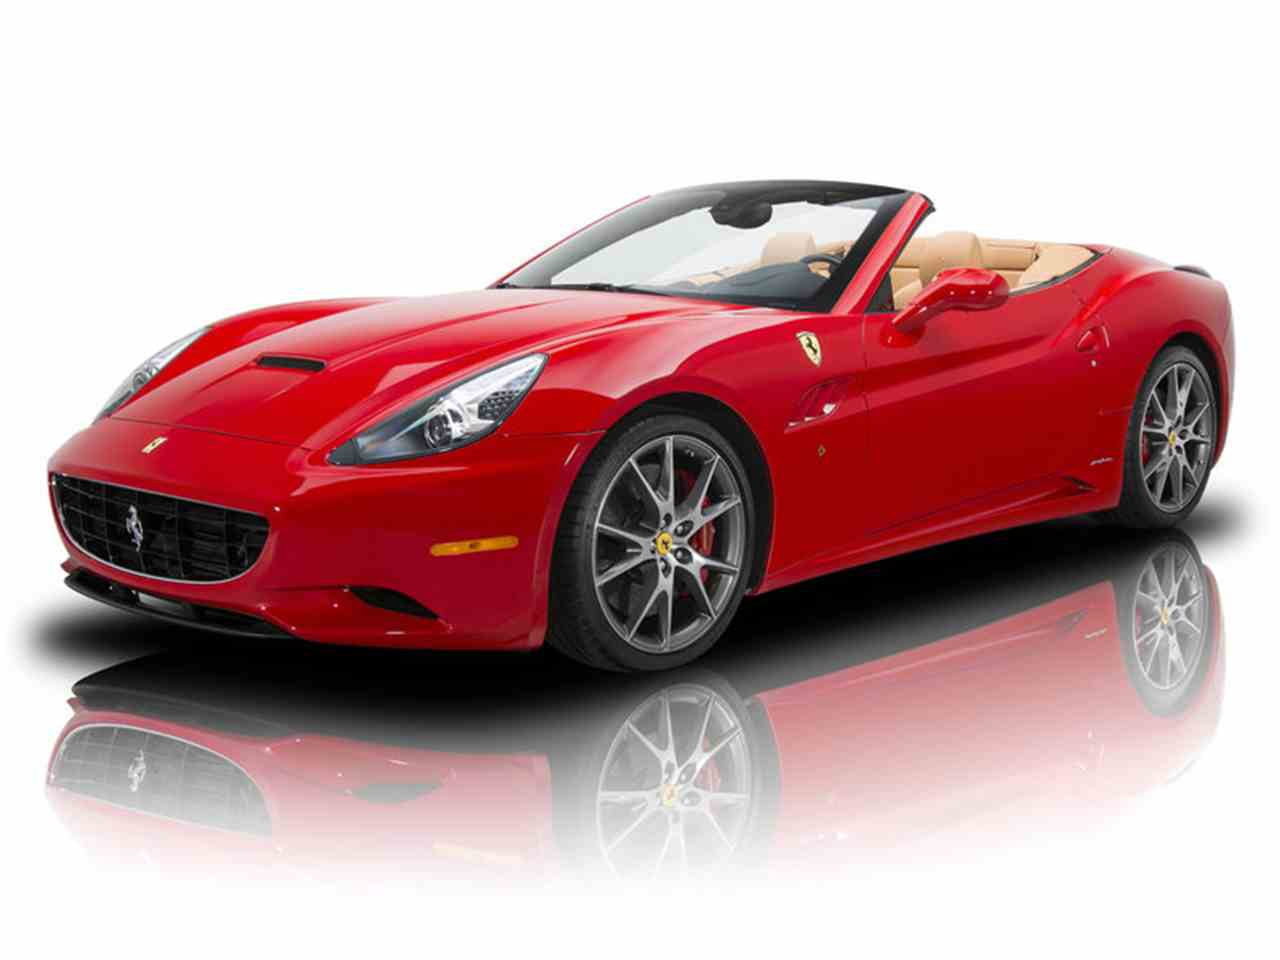 2010 Ferrari California for Sale - CC-1045394